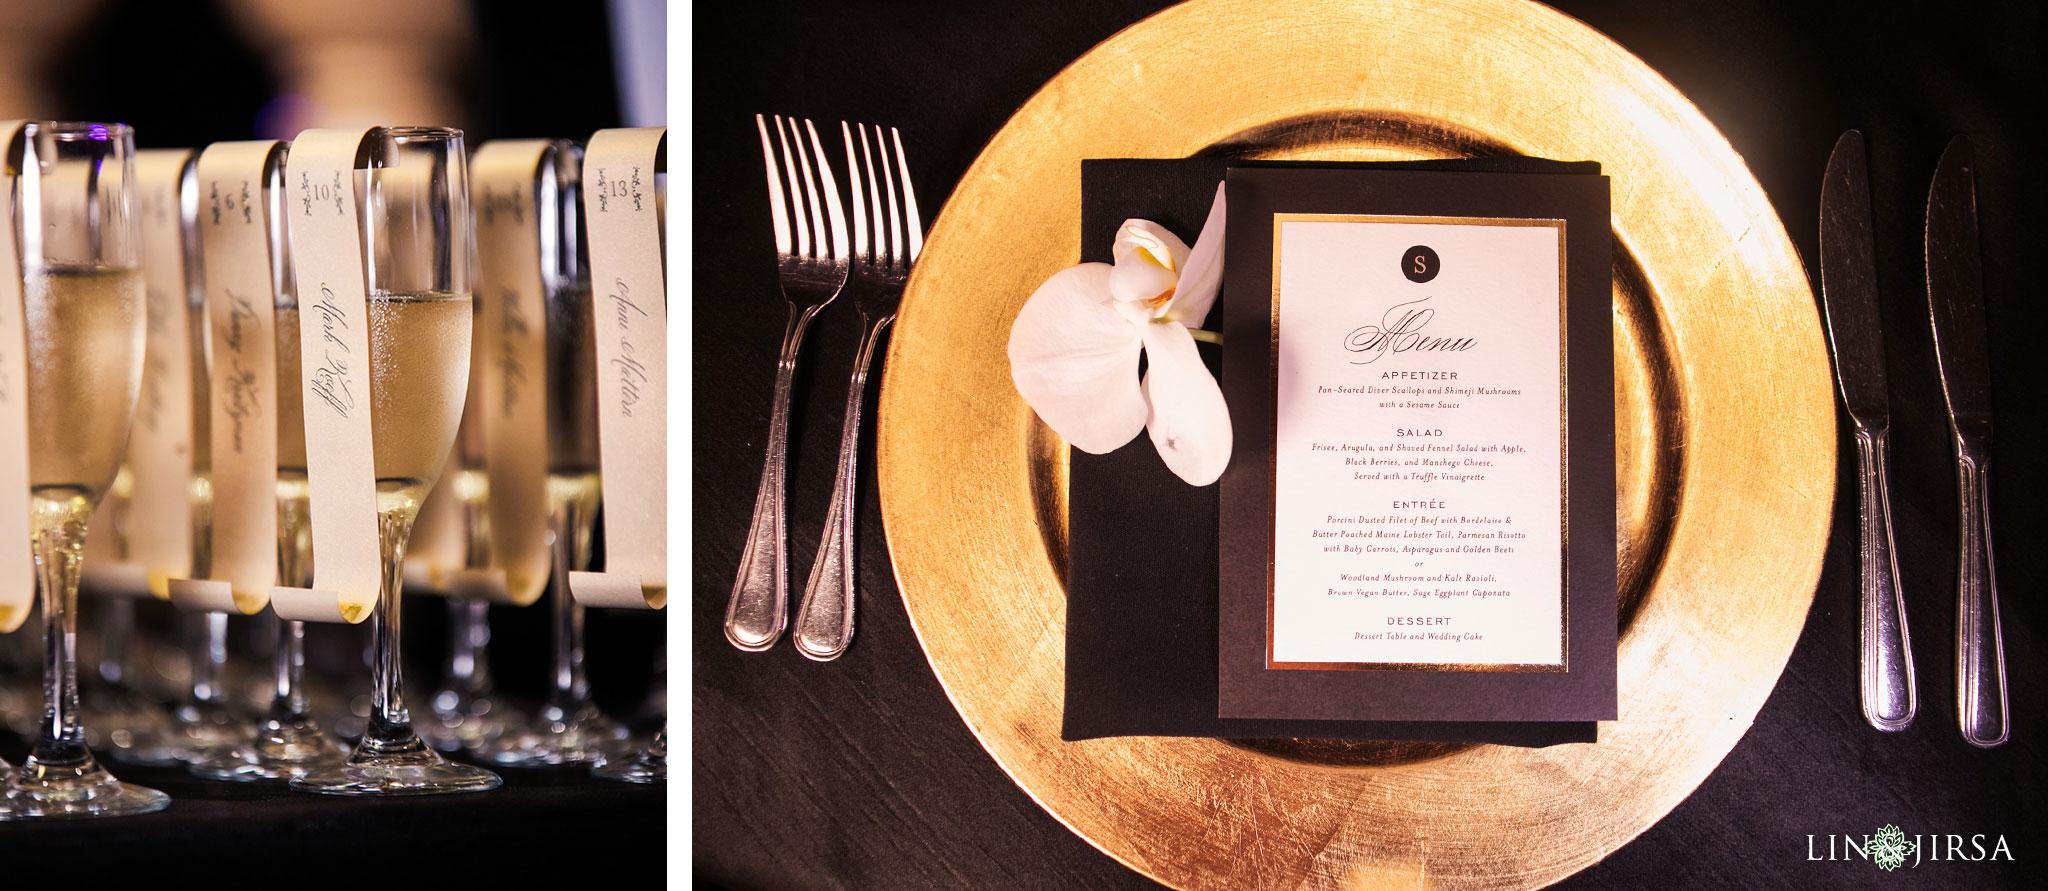 019 millennium biltmore hotel los angeles wedding photography